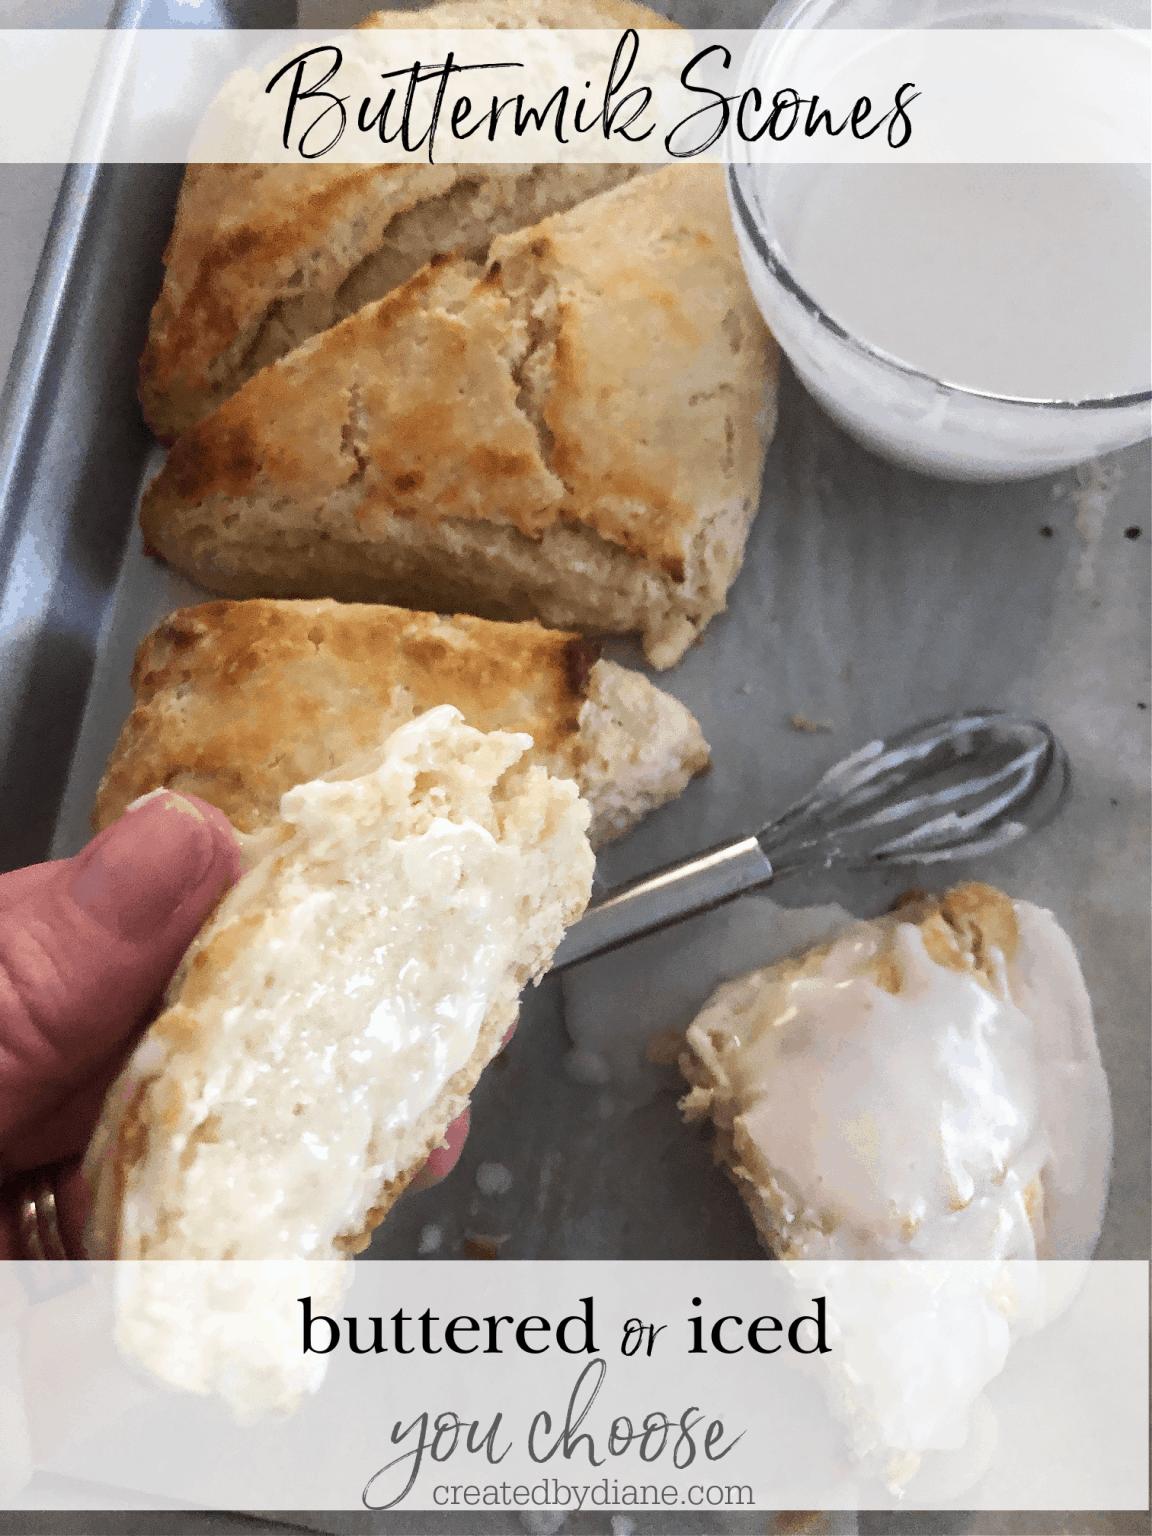 Buttermilk Scones Buttered Or Iced Sliced Open And Buttered Scones Iced On Top Buttermilk Scone Small Batch 4 Scone Recipe Creat In 2020 Scones Recipes Scone Recipe